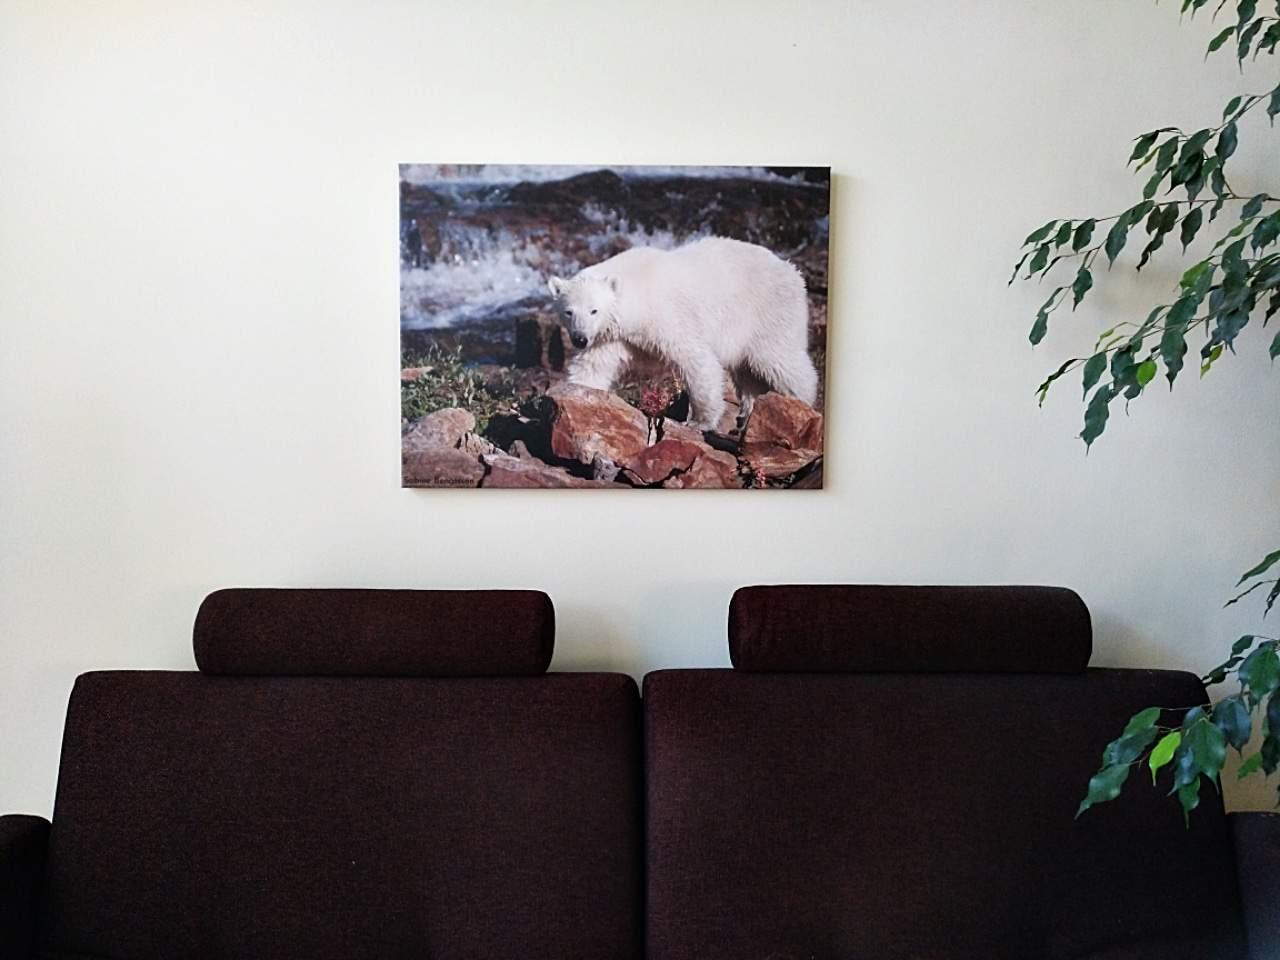 Fotoausstellung Kunst & Fell, Galerie Clic Clac Mölln